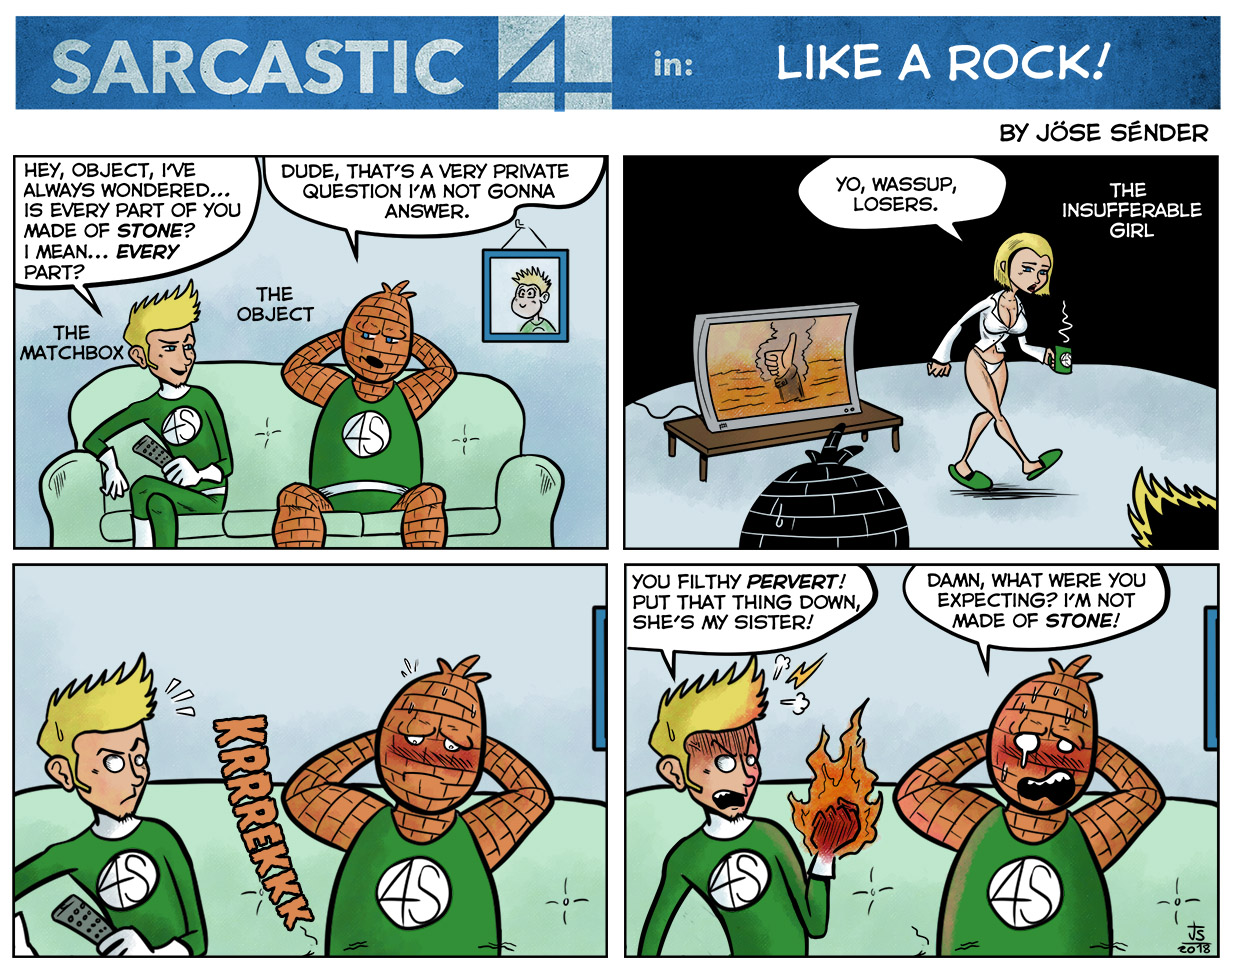 sarcastic four, fantastic four, parody, humor, comic, webcomic, marvel, superheroes, parodia,